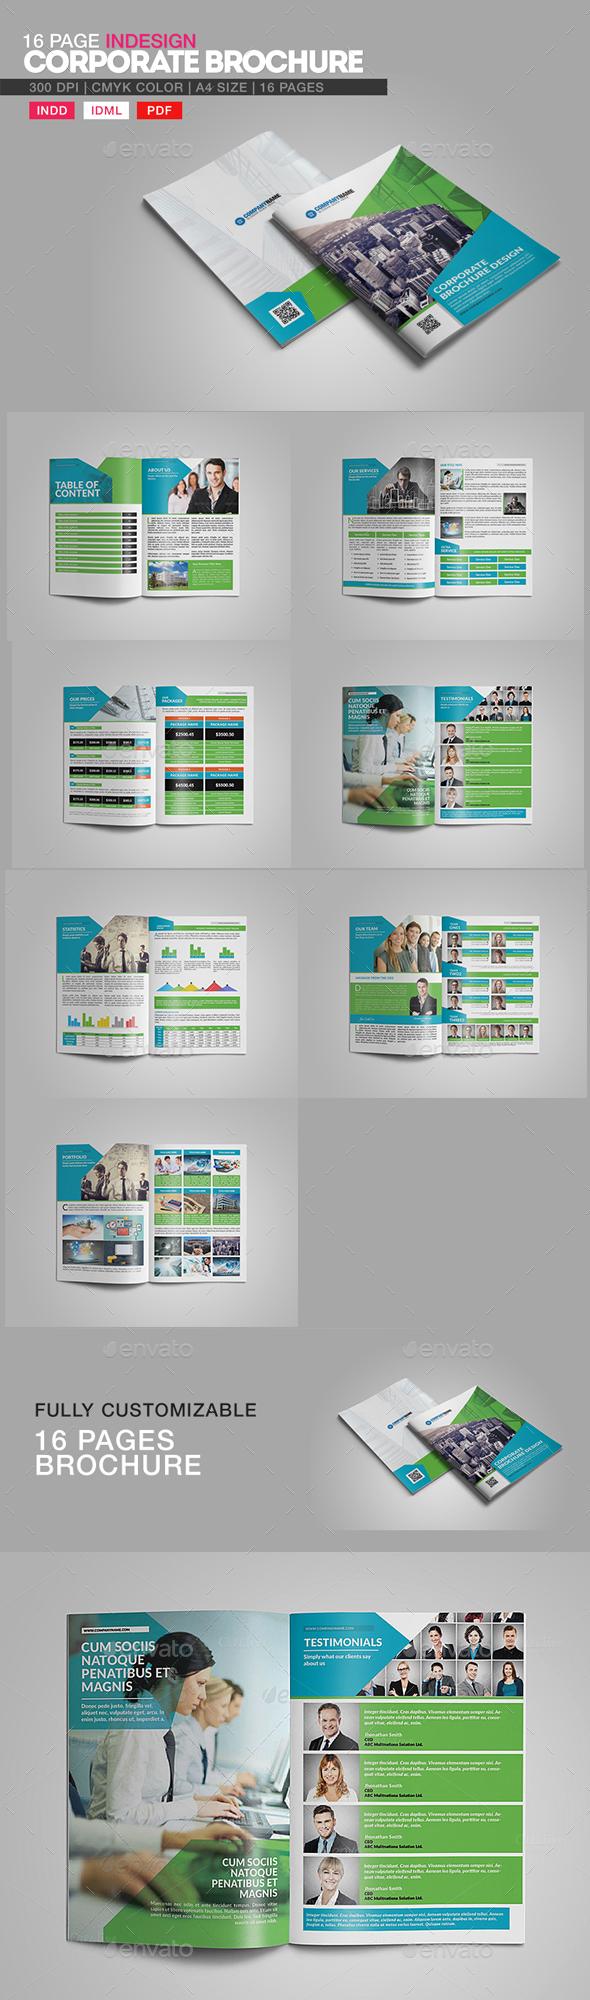 16 Page InDesign Corporate Brochure - Corporate Brochures